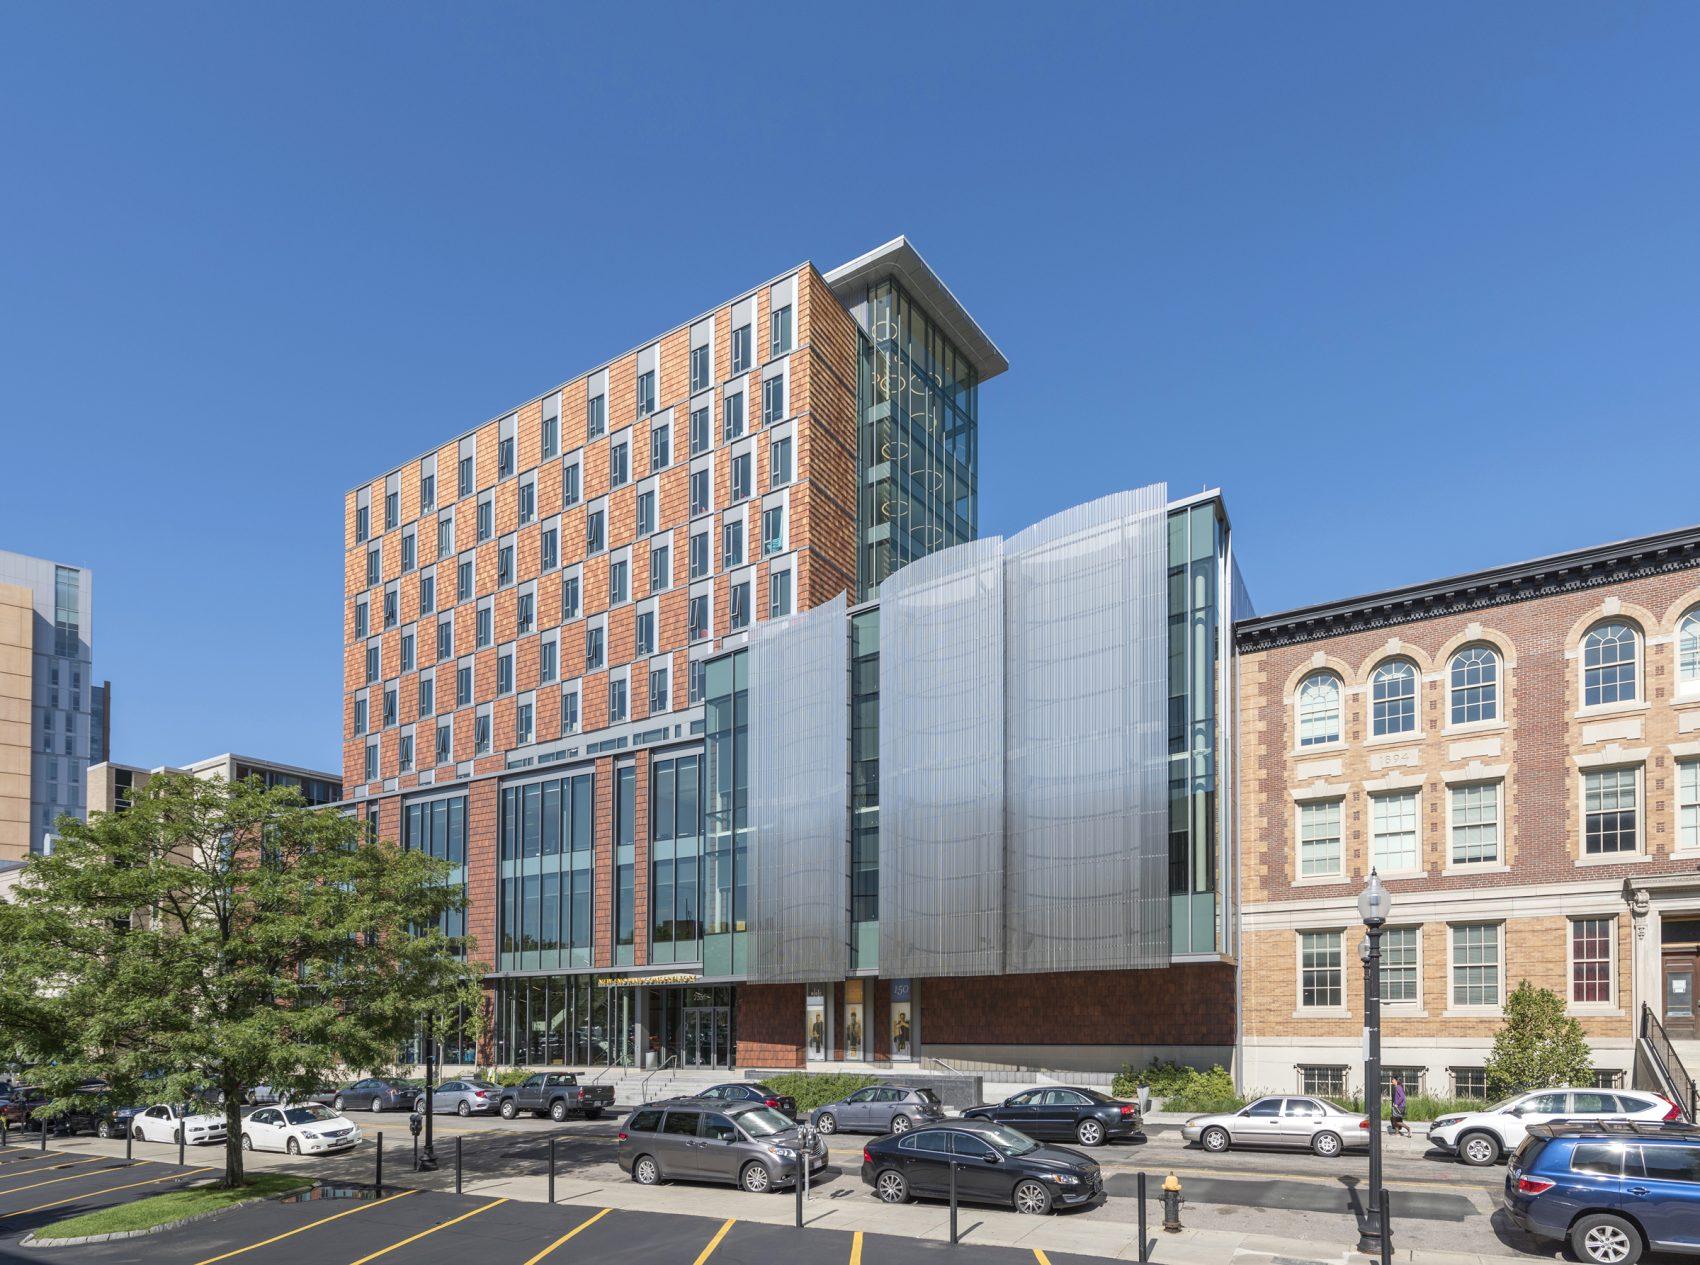 The exterior of NEC's new student center. (Courtesy Peter Vanderwarker)